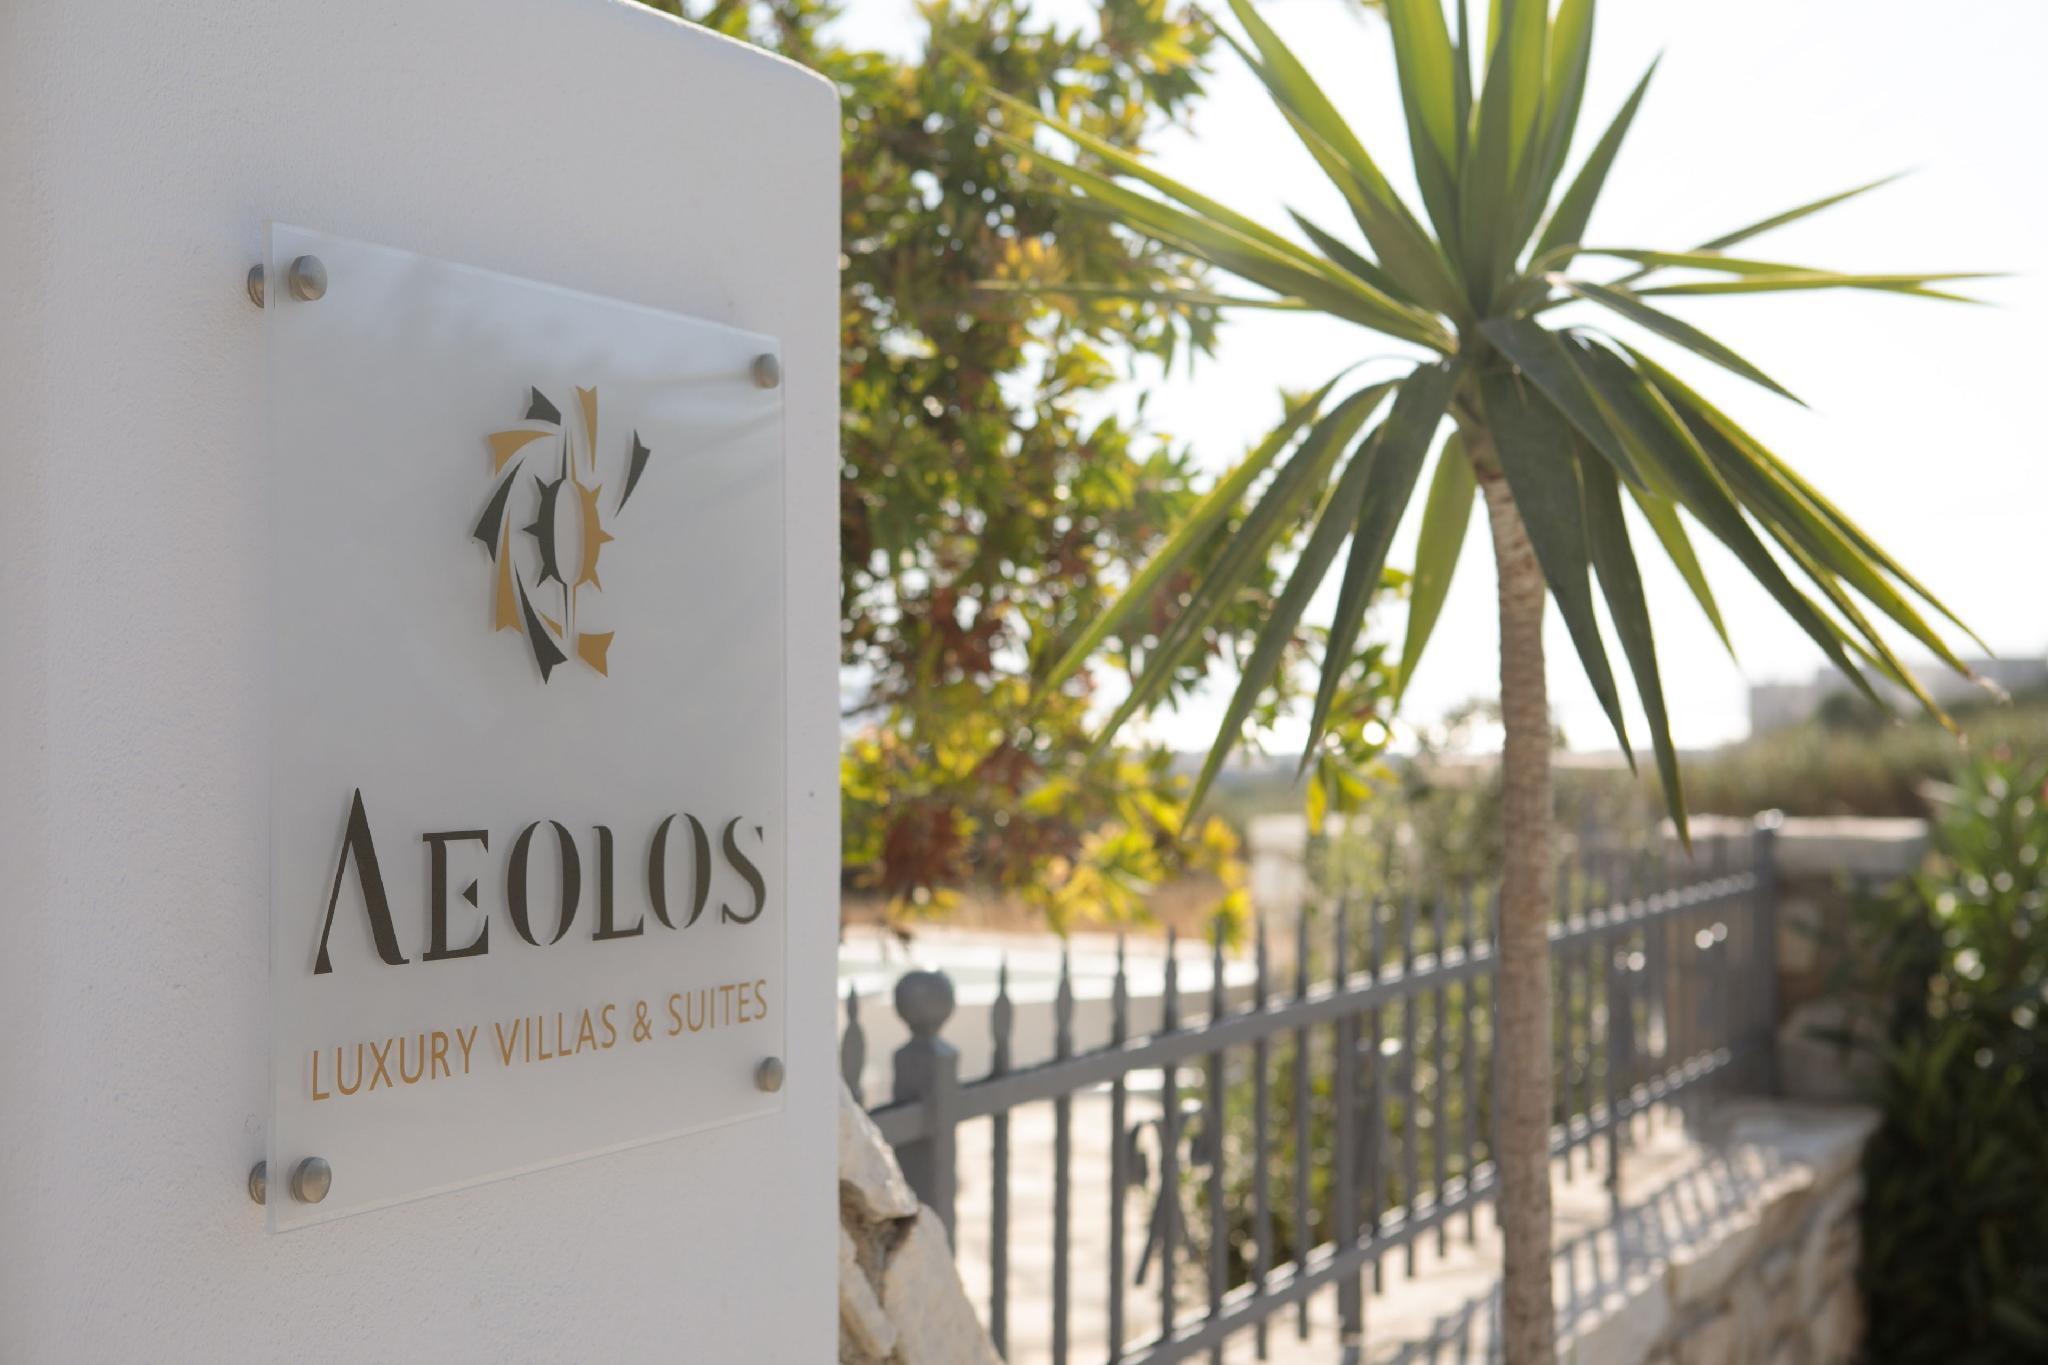 Aeolos Luxury Villas And Suites